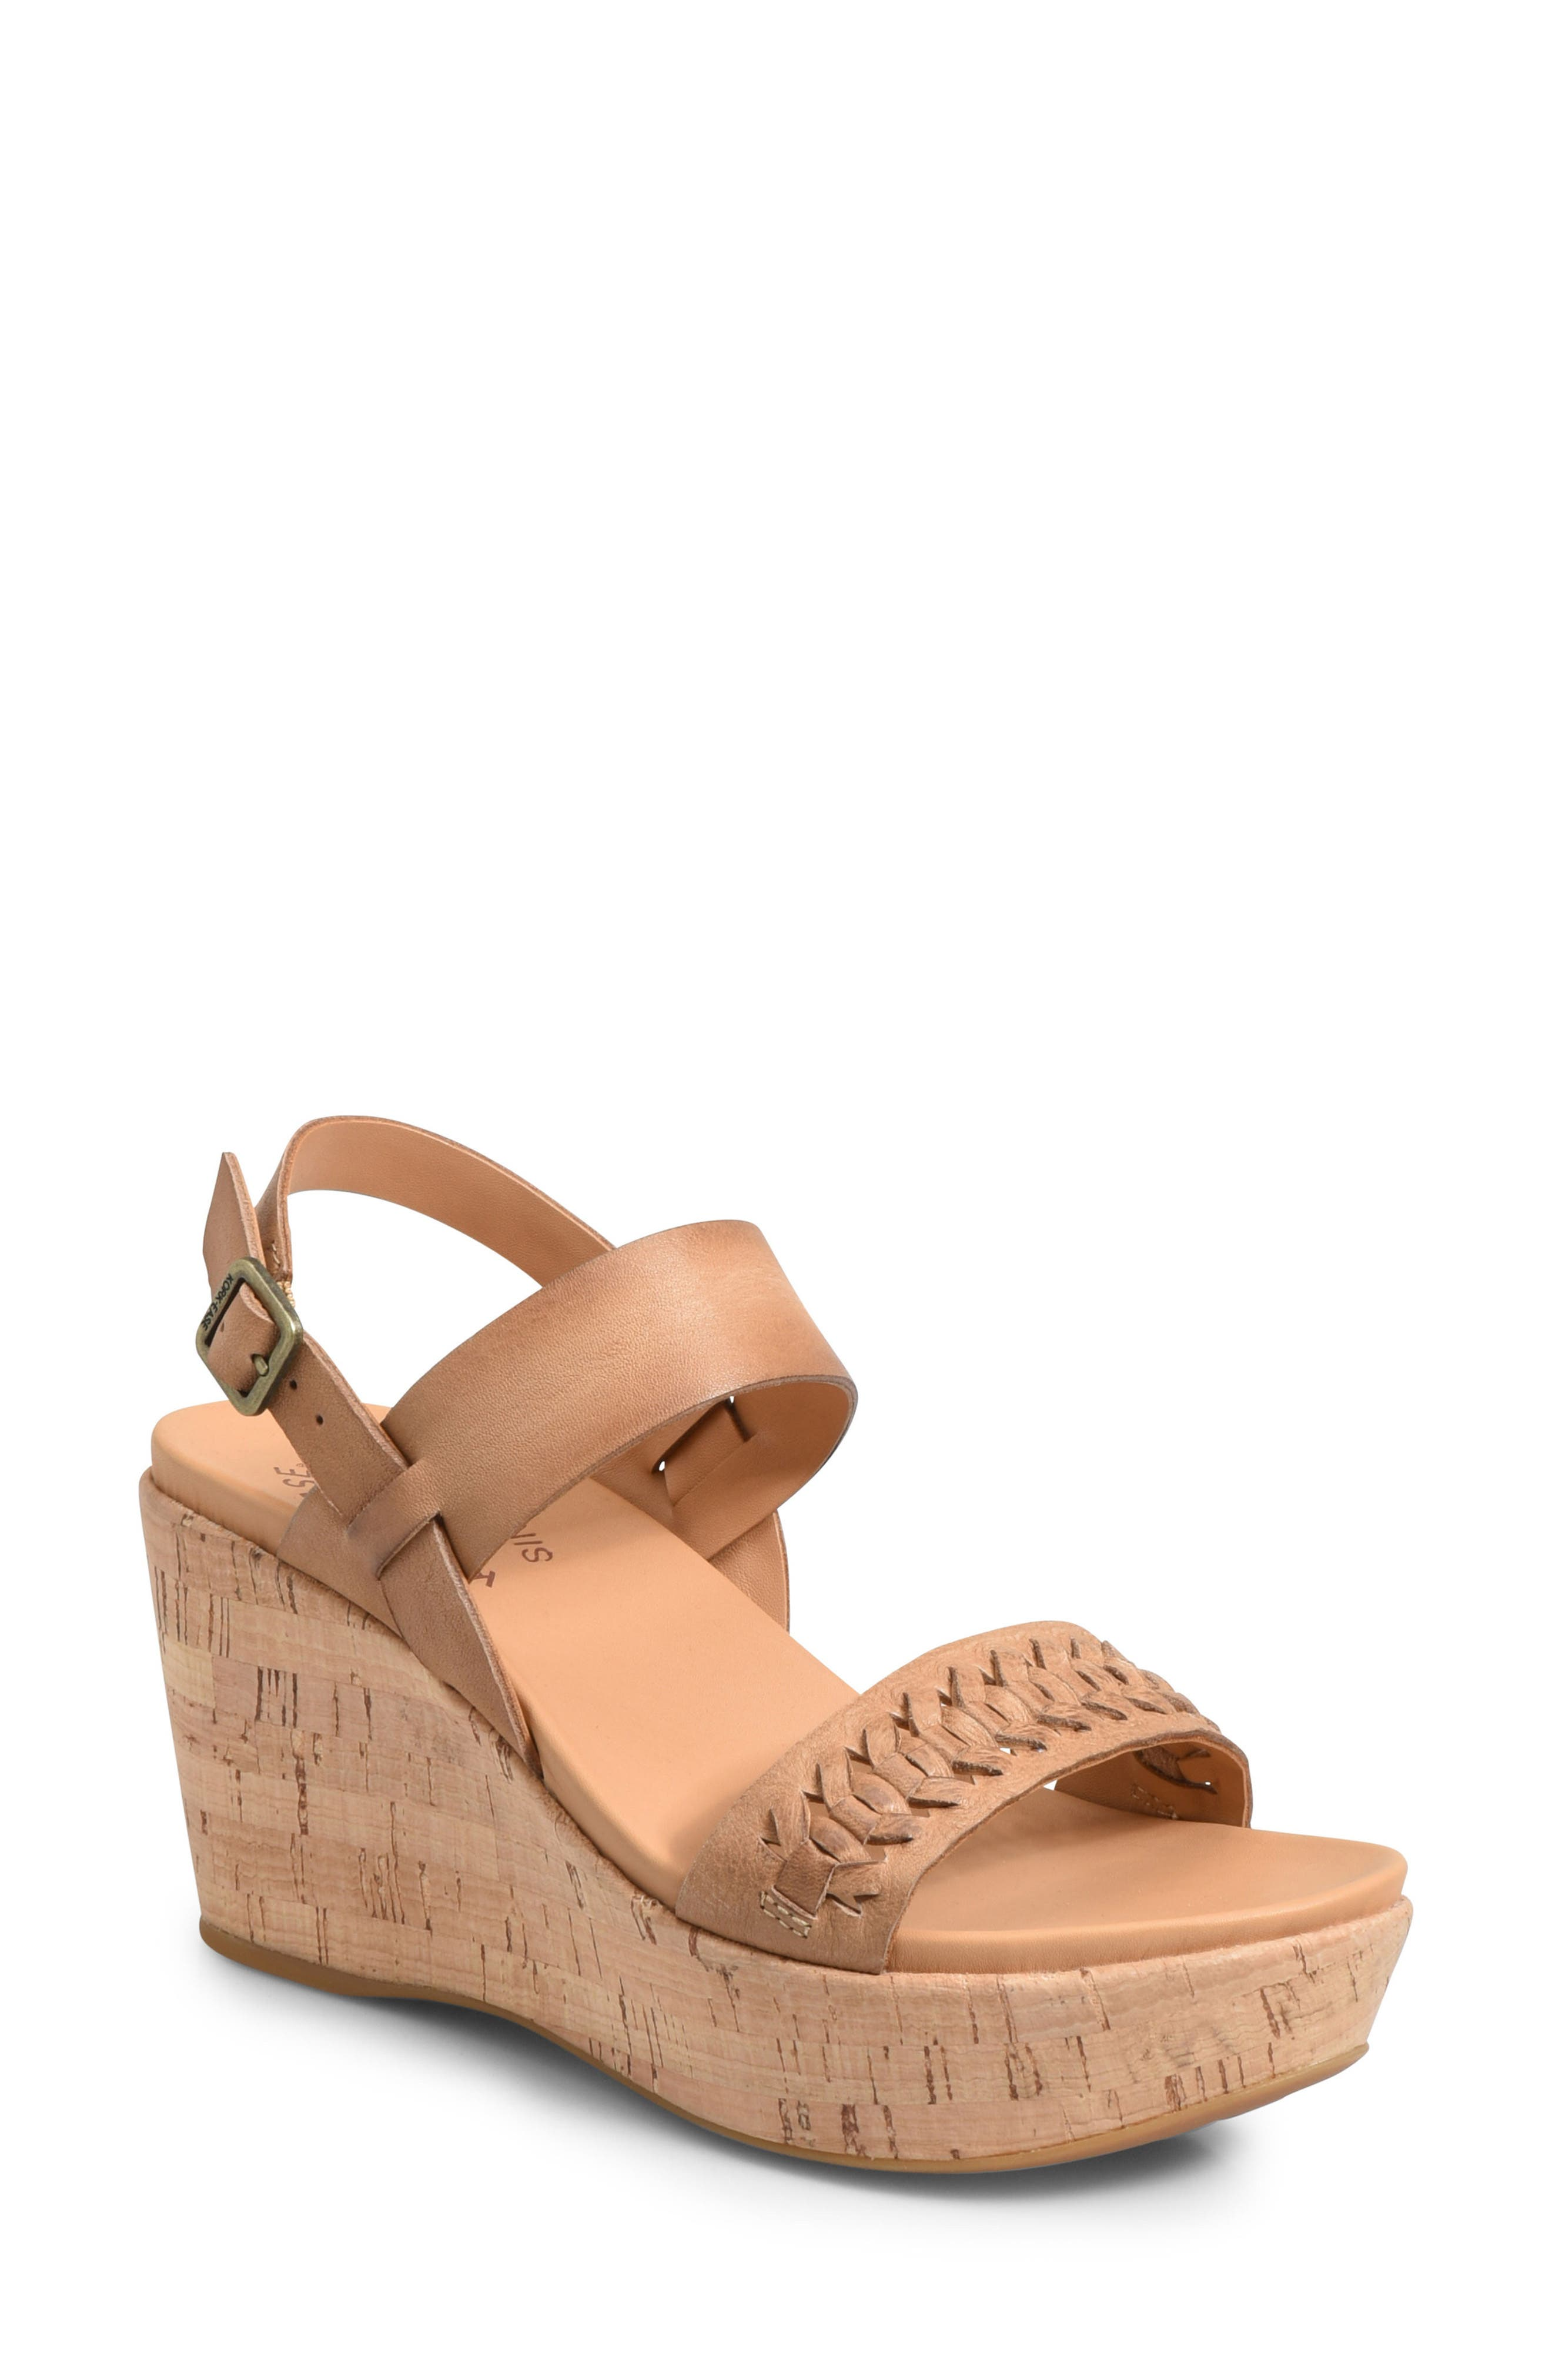 Kork-Ease Austin Braid Wedge Sandal, Brown